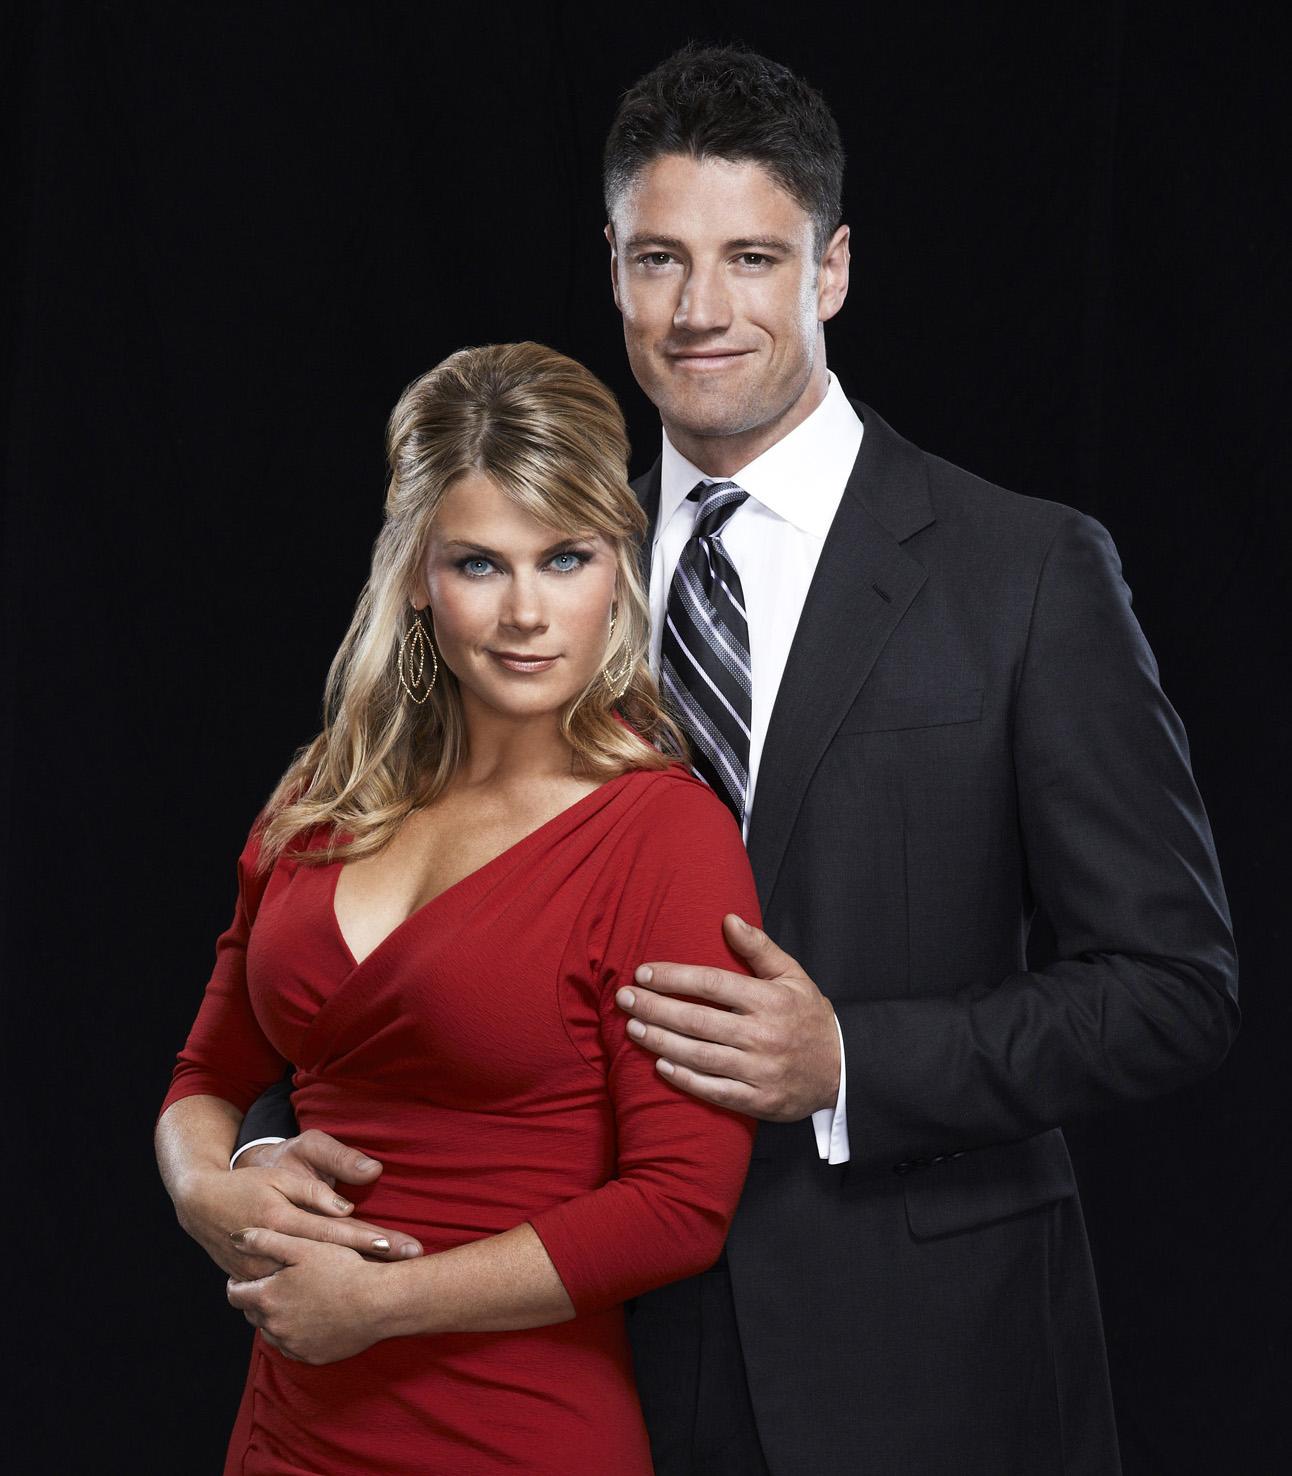 Alison sweeney and james scott dating now